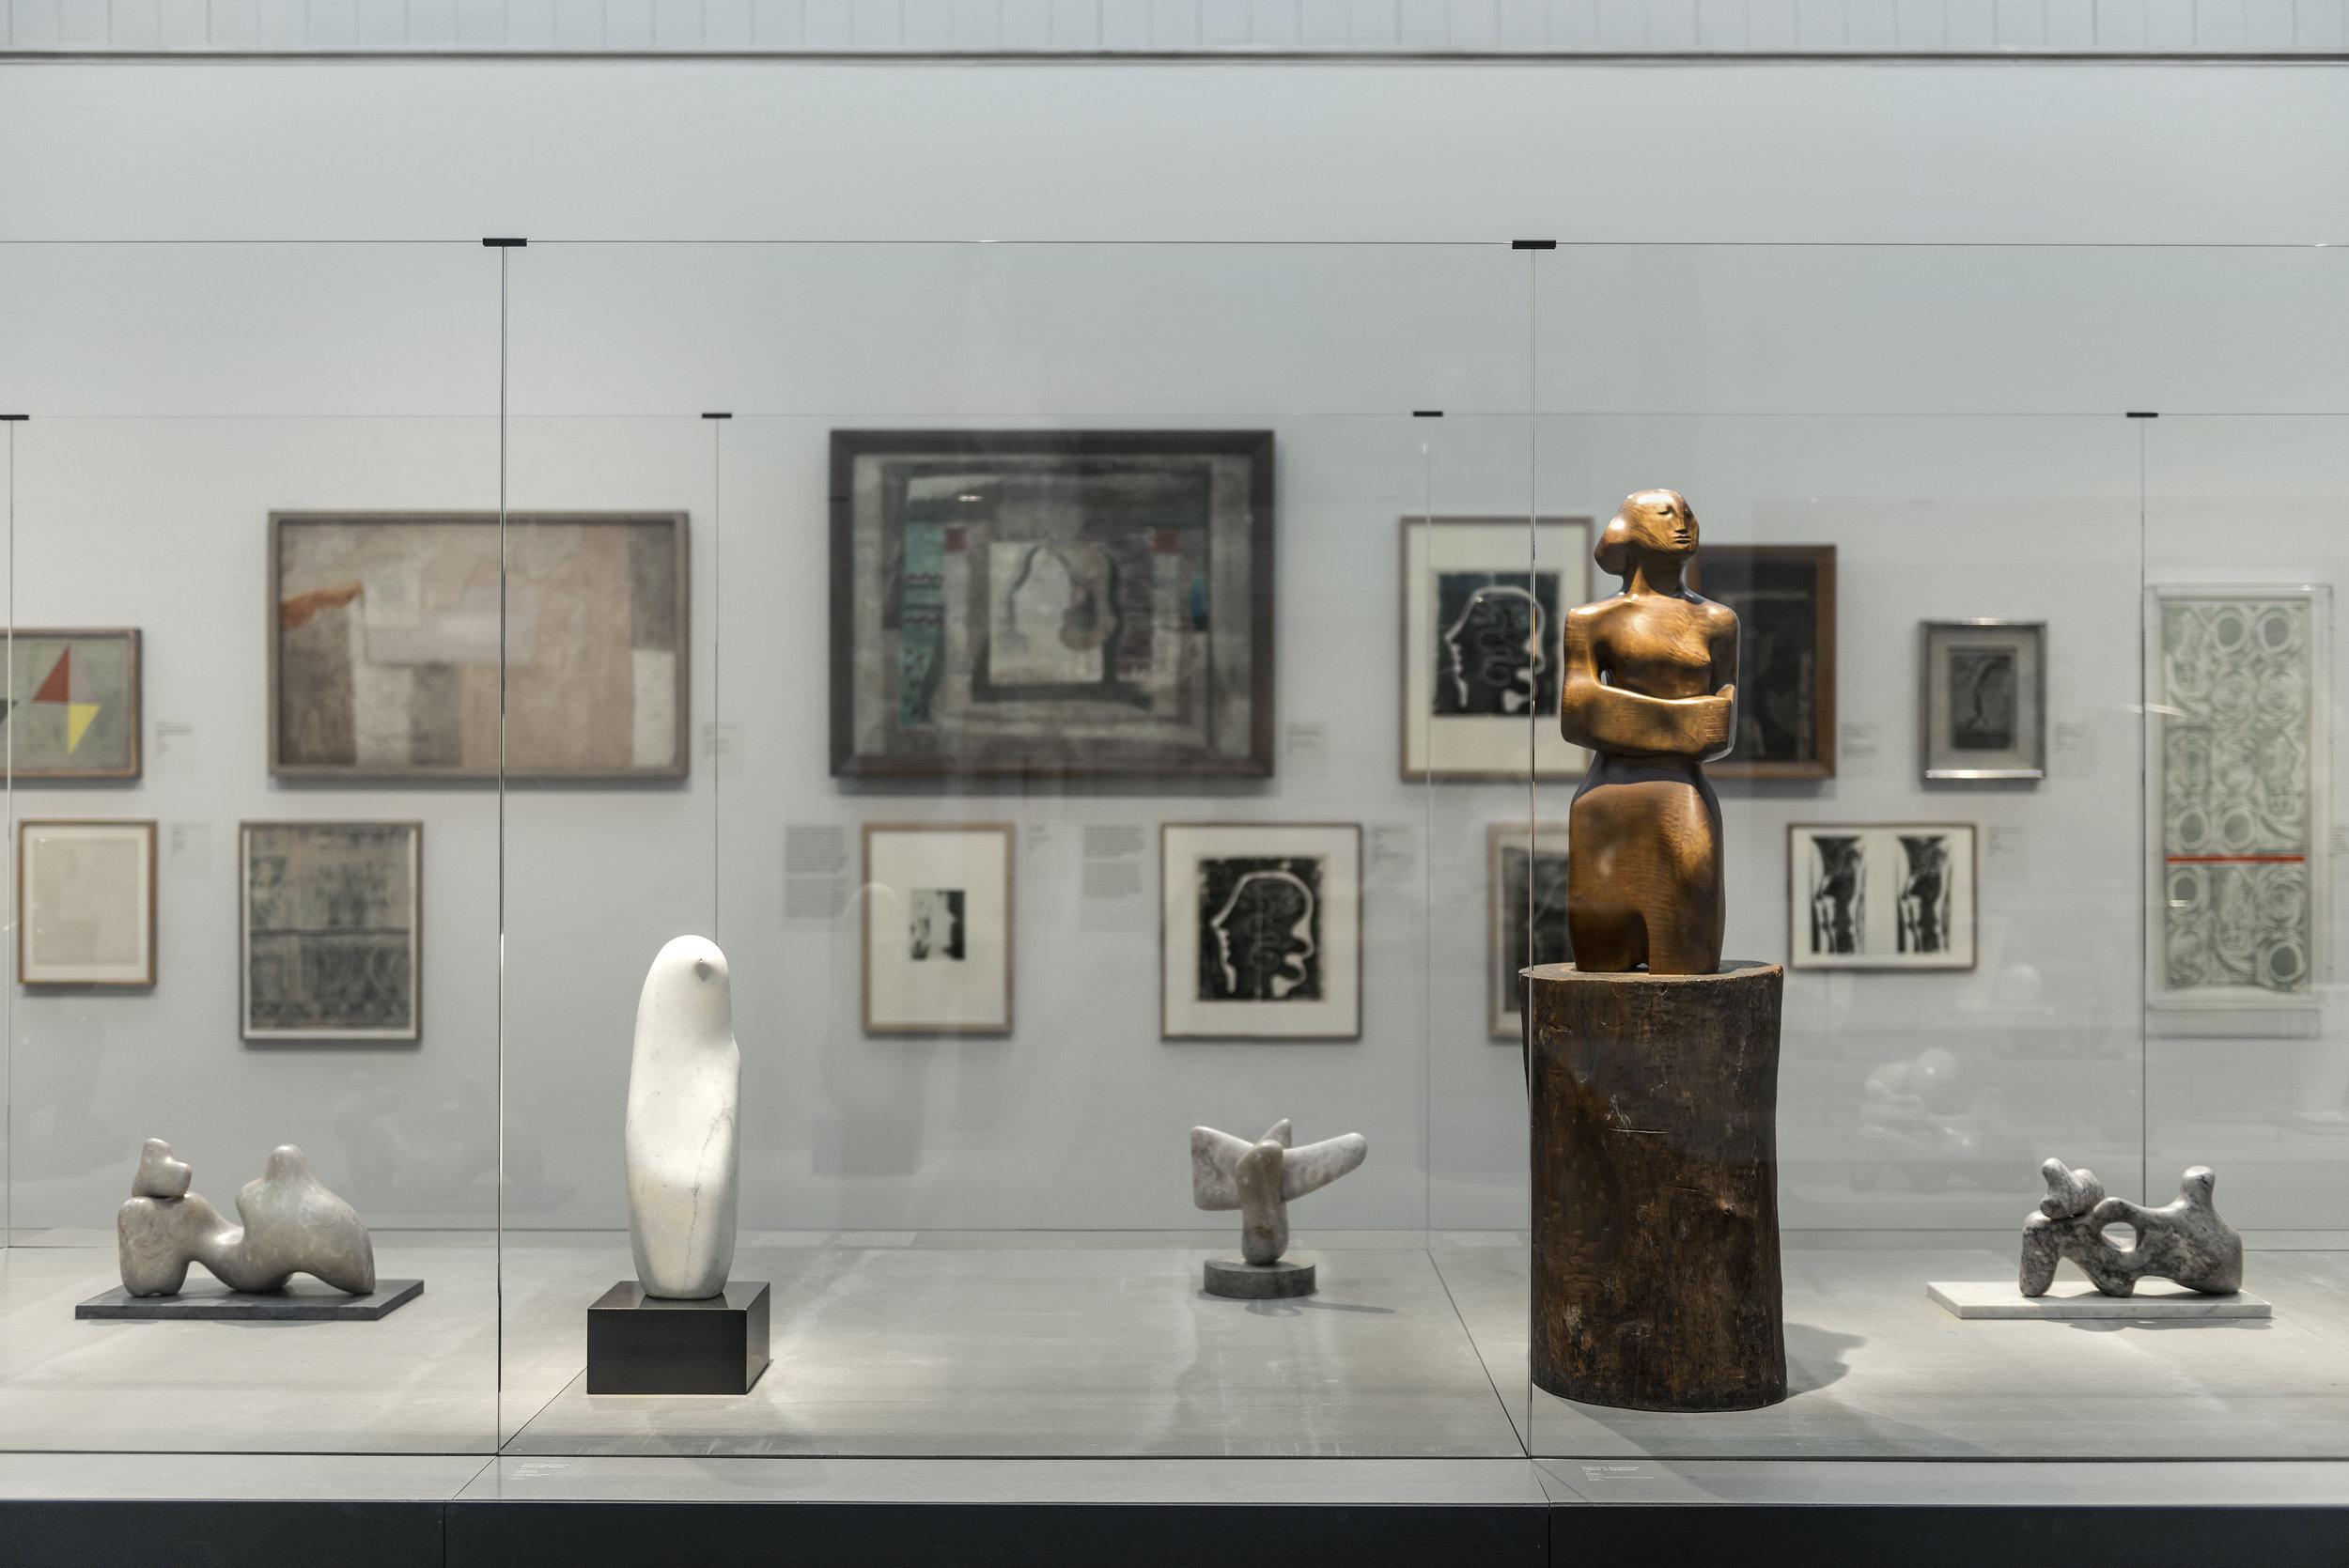 Kröller-Müller Museum 'Barbara Hepworth'